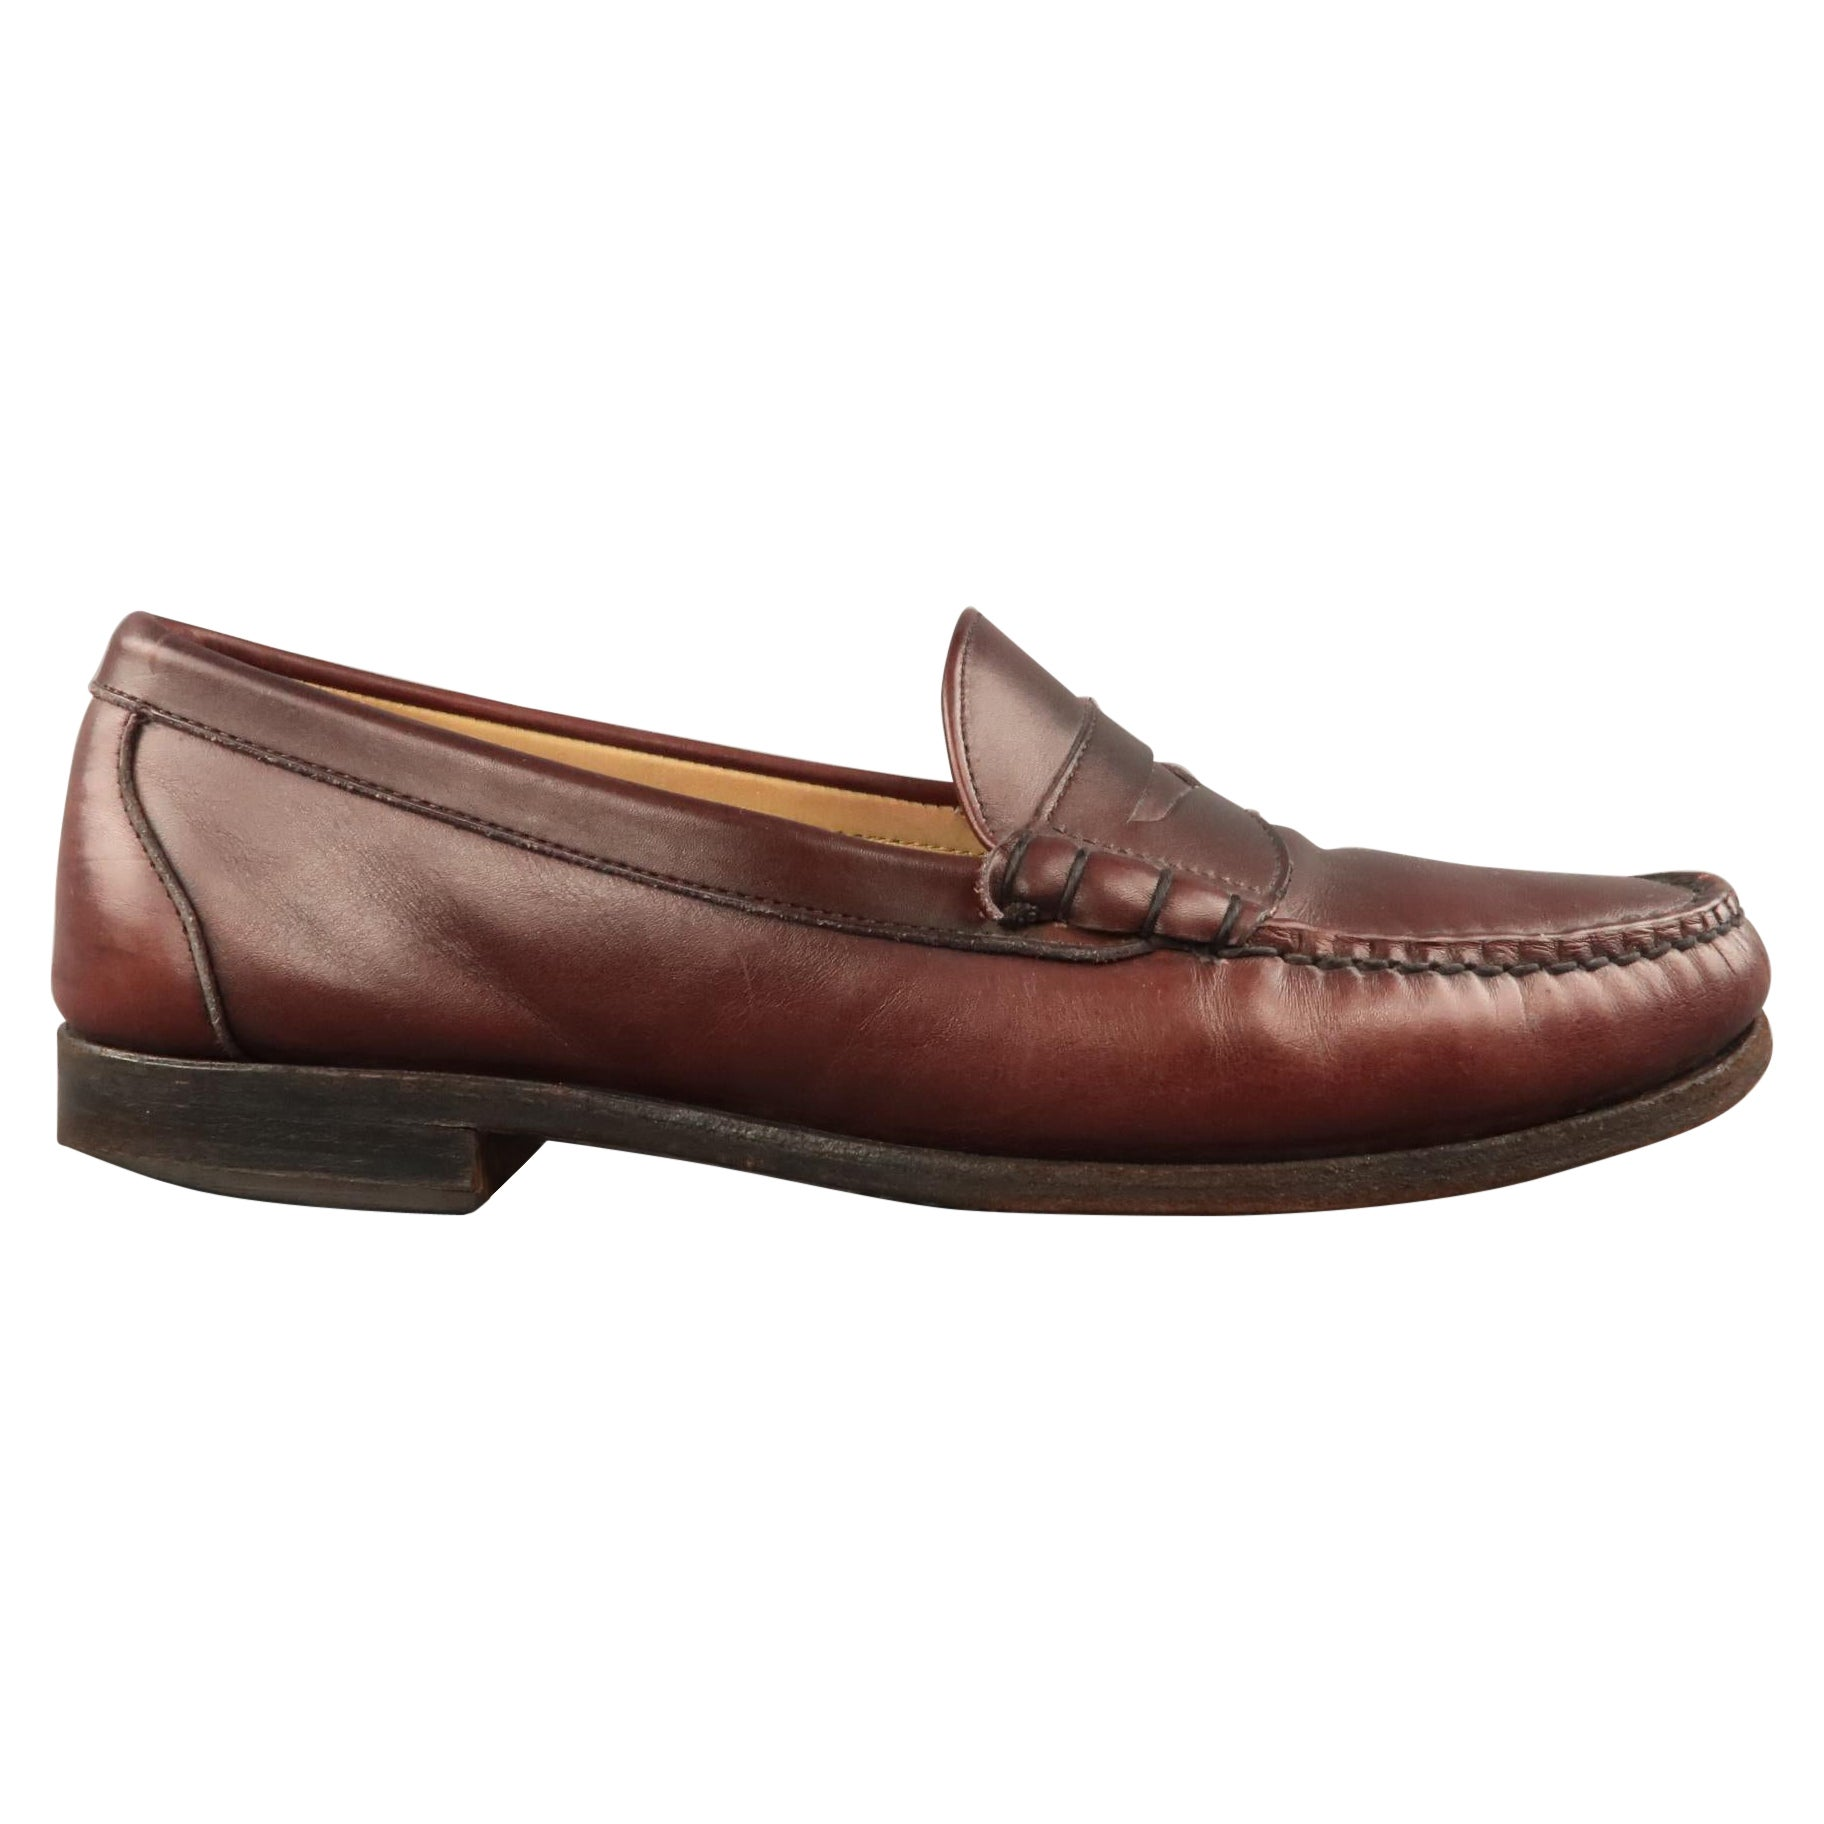 ALLEN EDMONDS Size 10 Burgundy Leather Slip On Penny Loafers Shoes